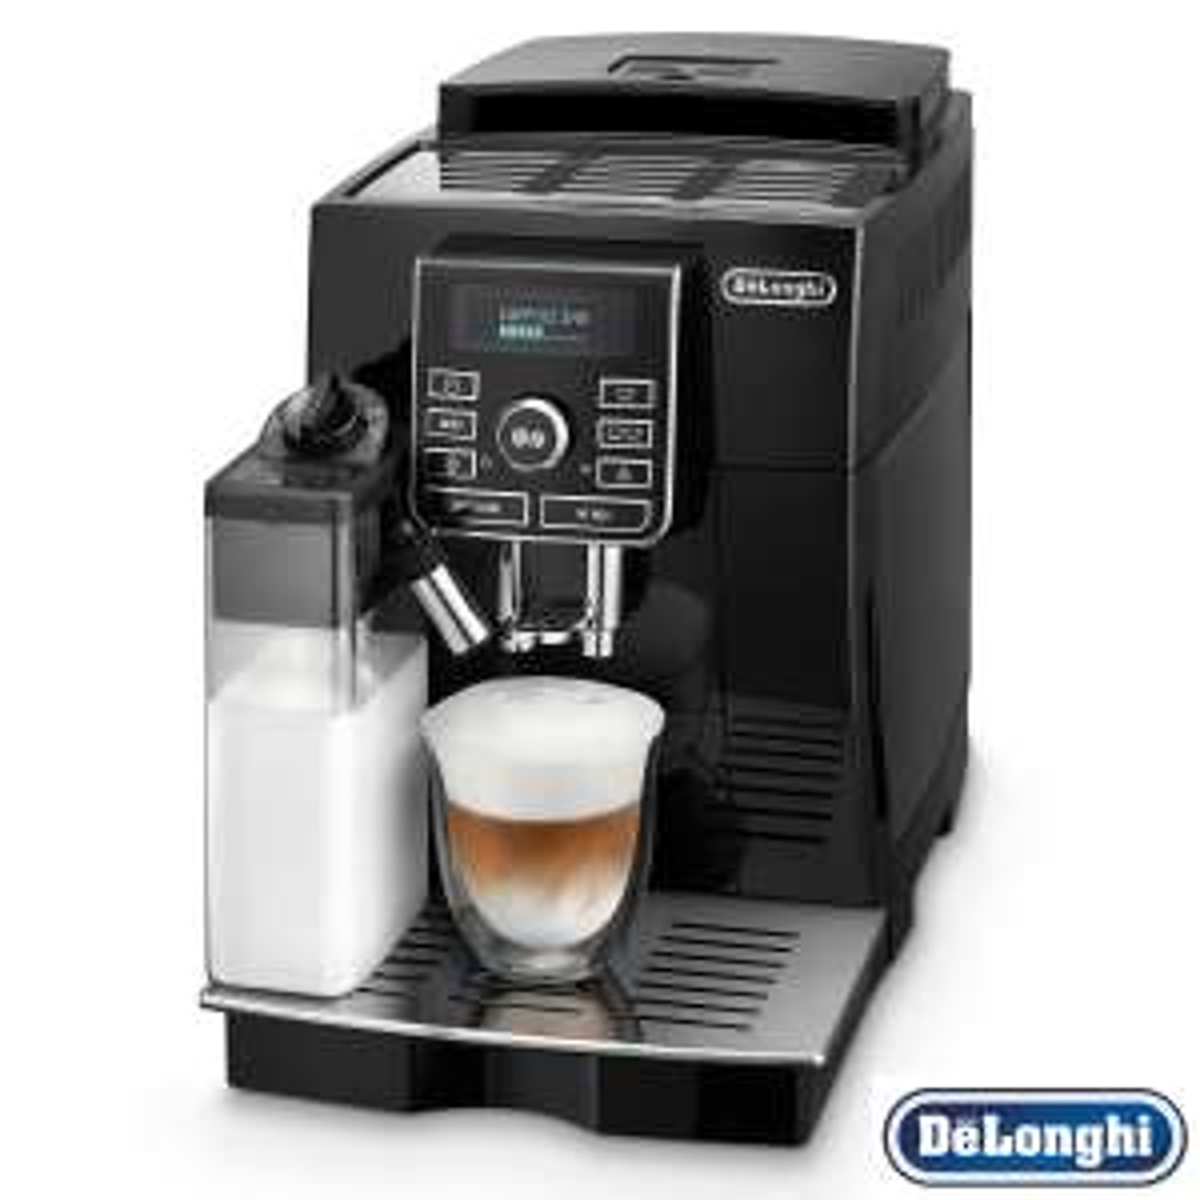 De'Longhi Magnifica Bean To Cup Coffee Machine ECAM25.462.B £332.98 @ Costco